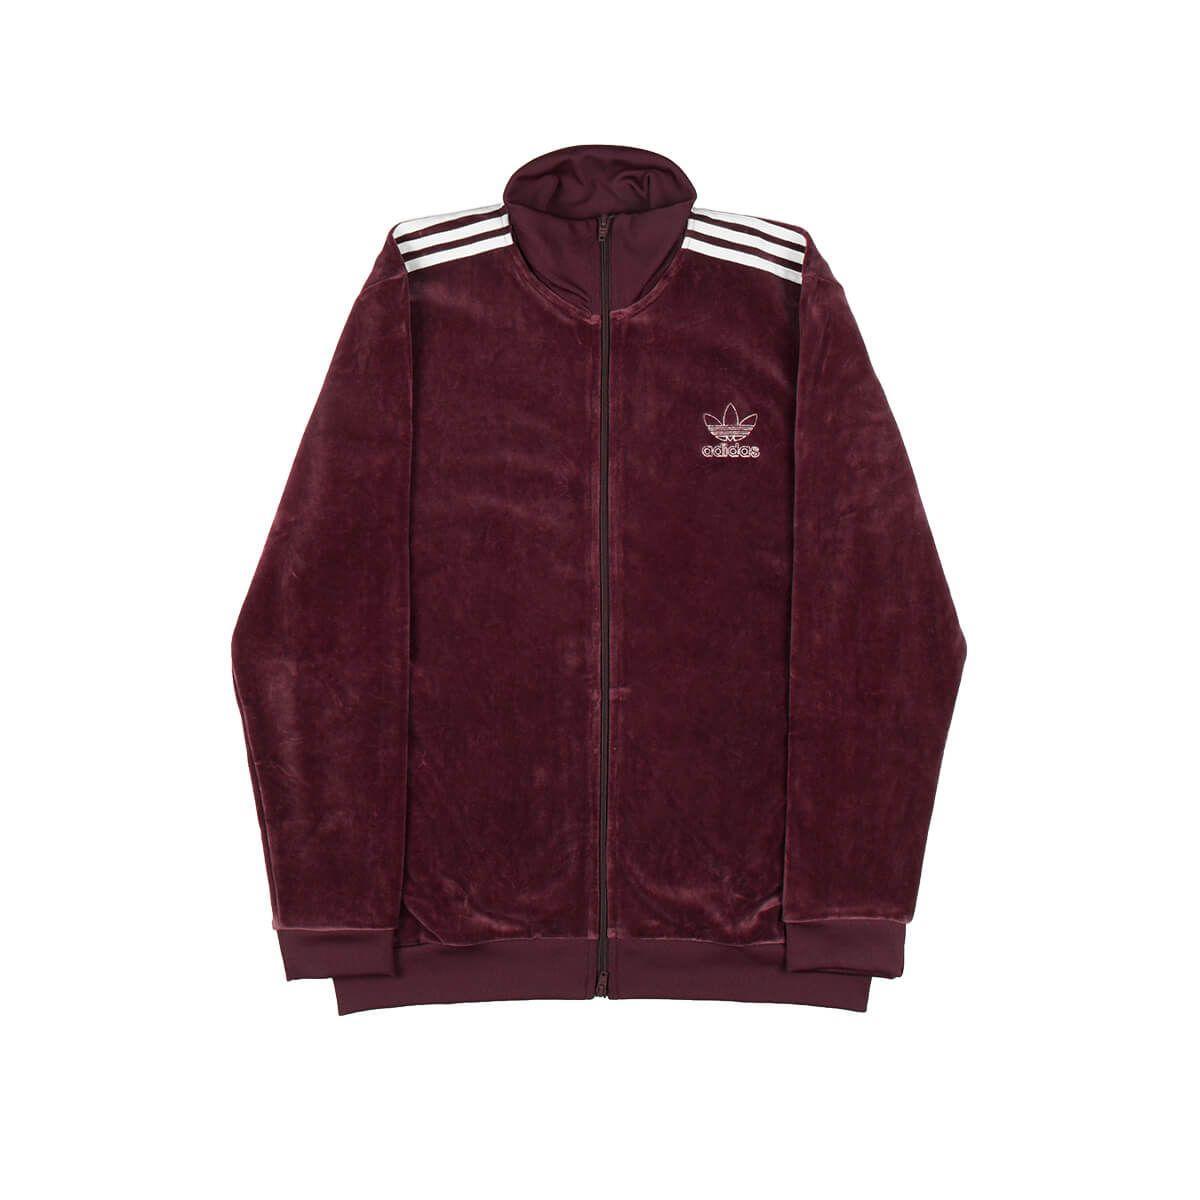 bb14ecd729d Adidas Originals Velour Bb Track Top In Red